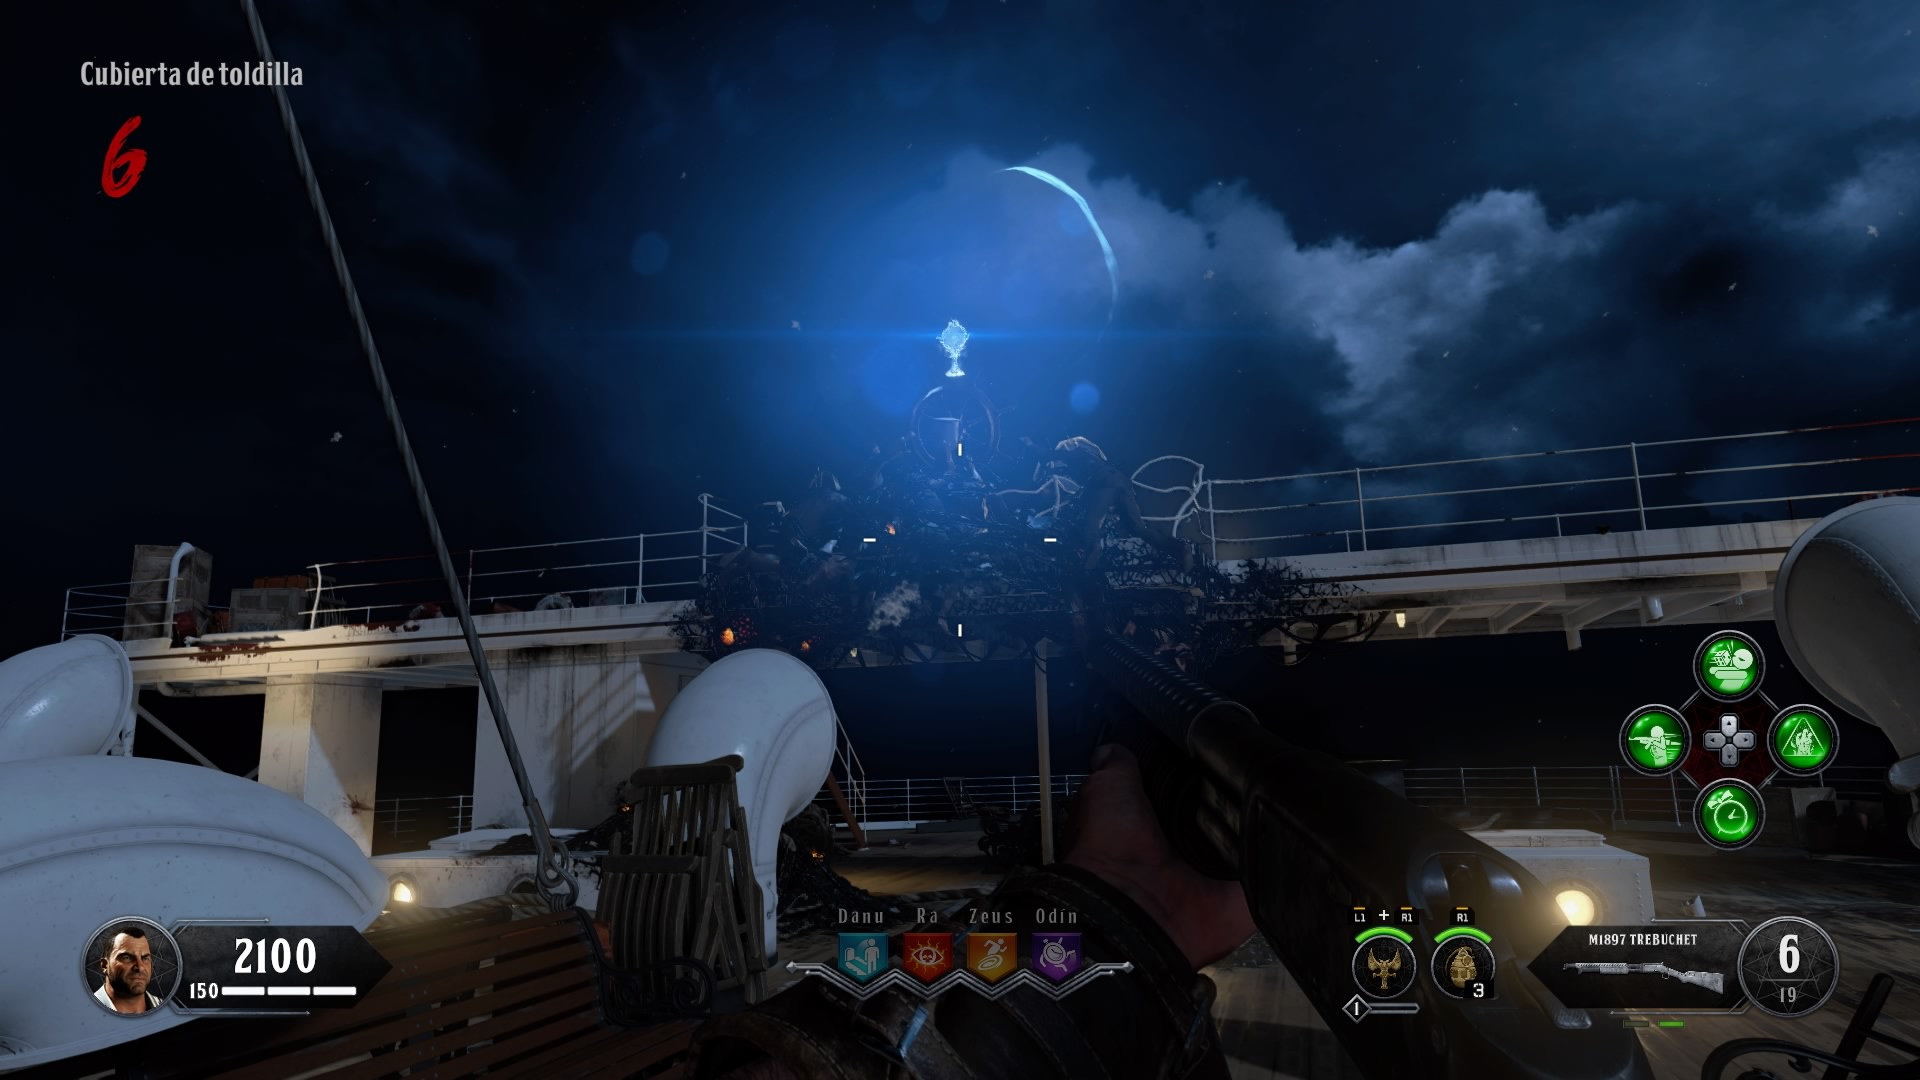 black ops iiii, titanic, máquina de mejora, potenciadora,